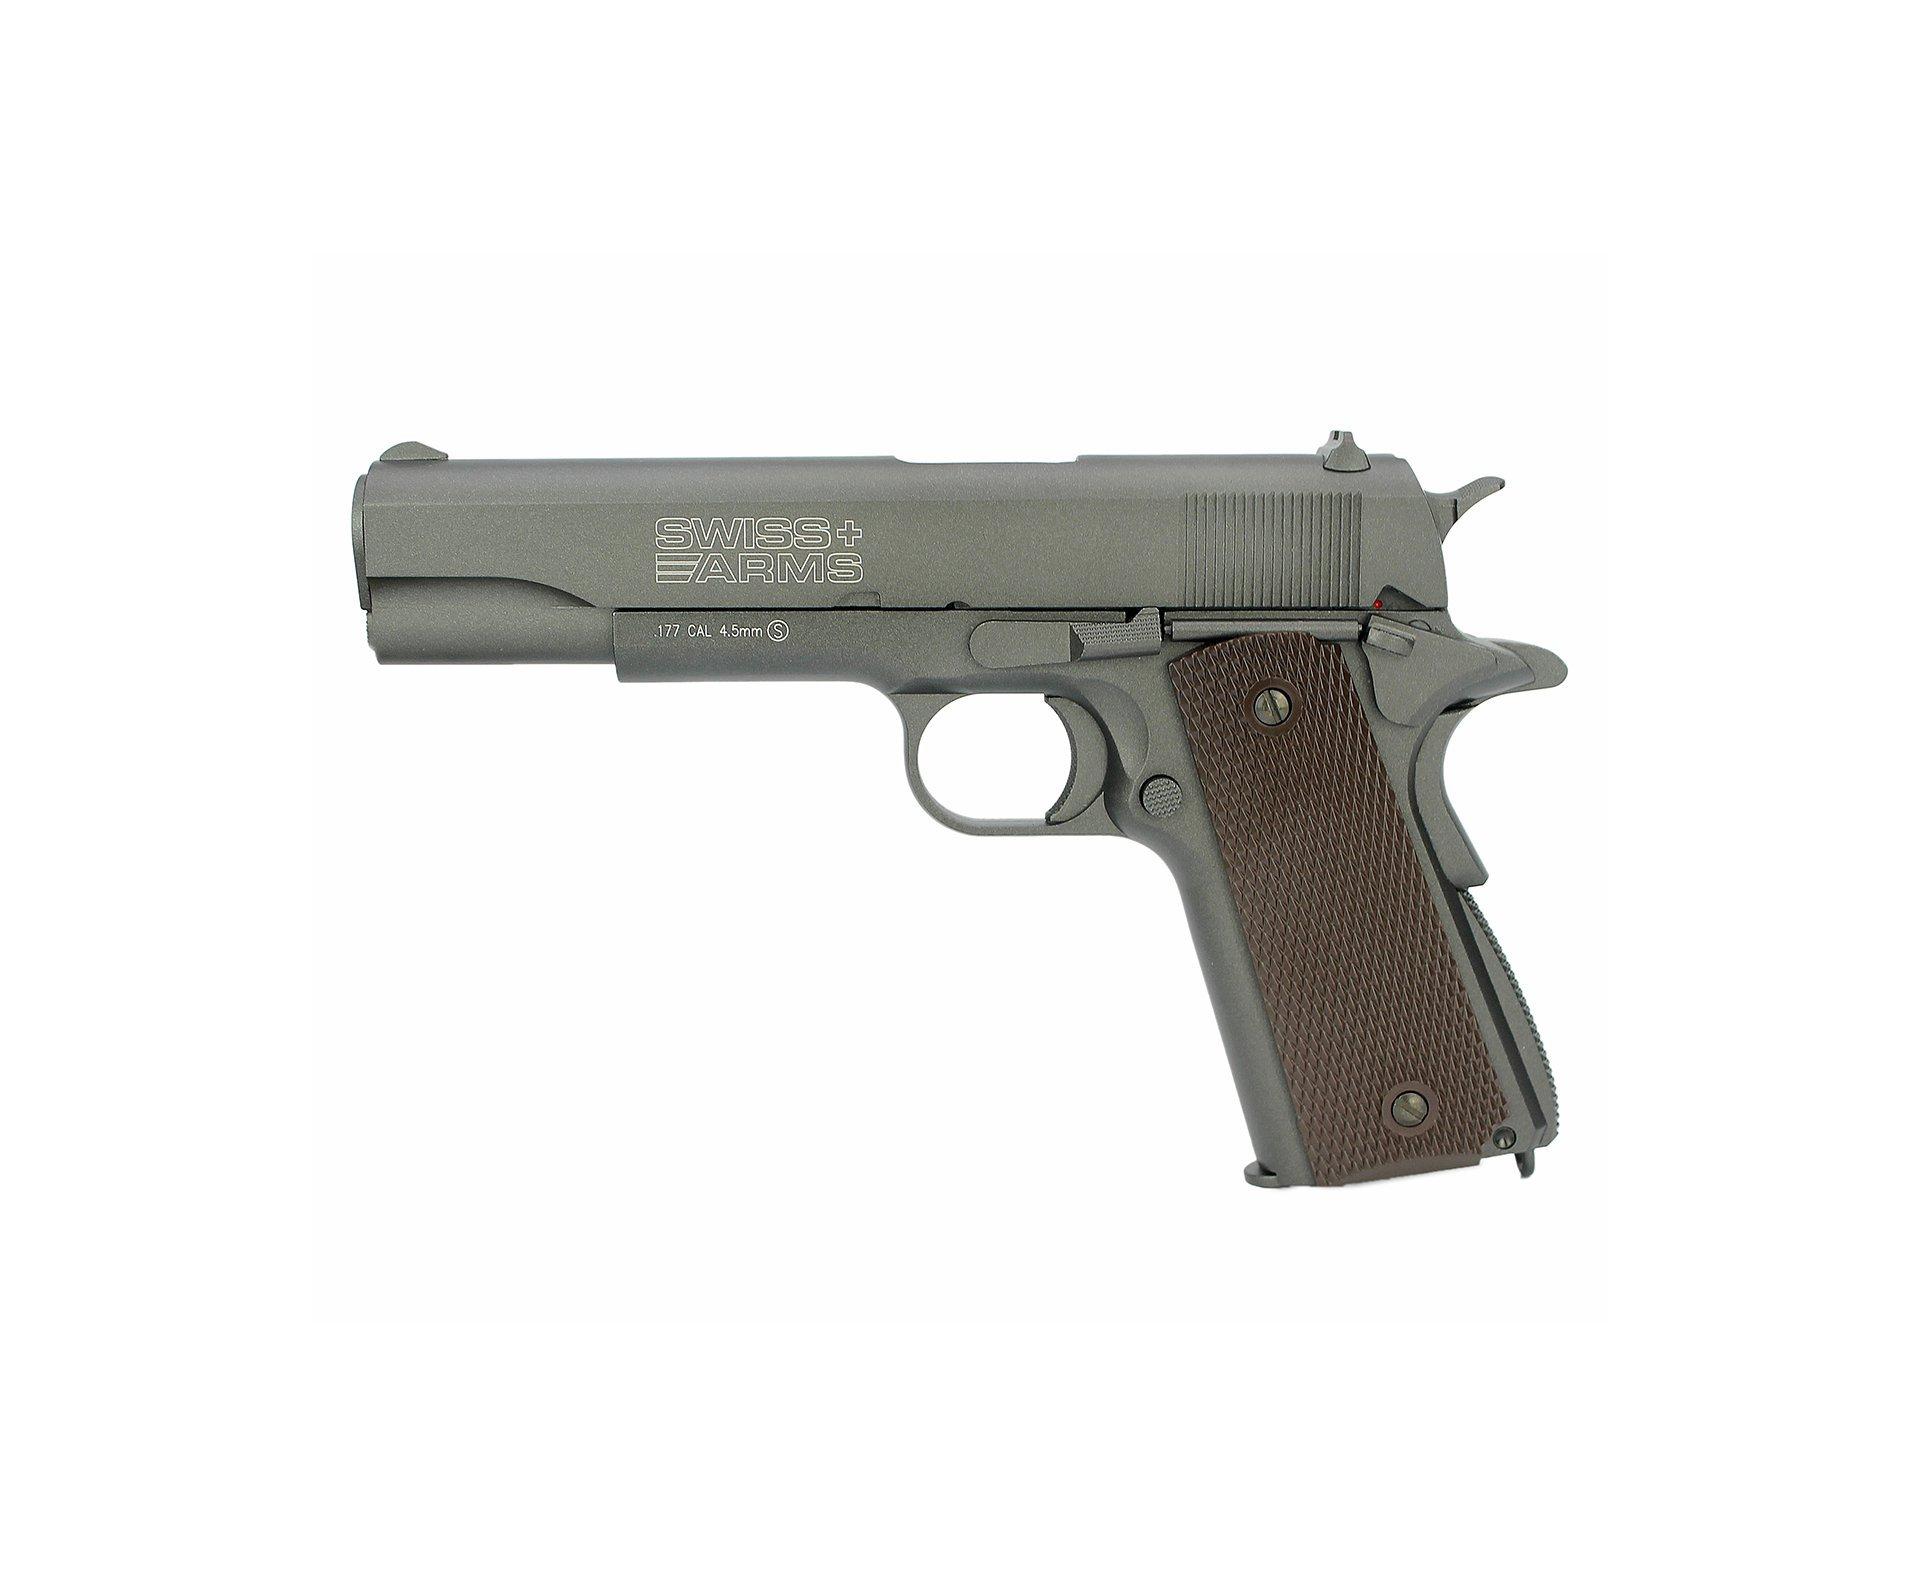 Pistola De Pressão Gas Co2 Sa P1911 Full Metal Blowblack 4.5mm Swiss Arms